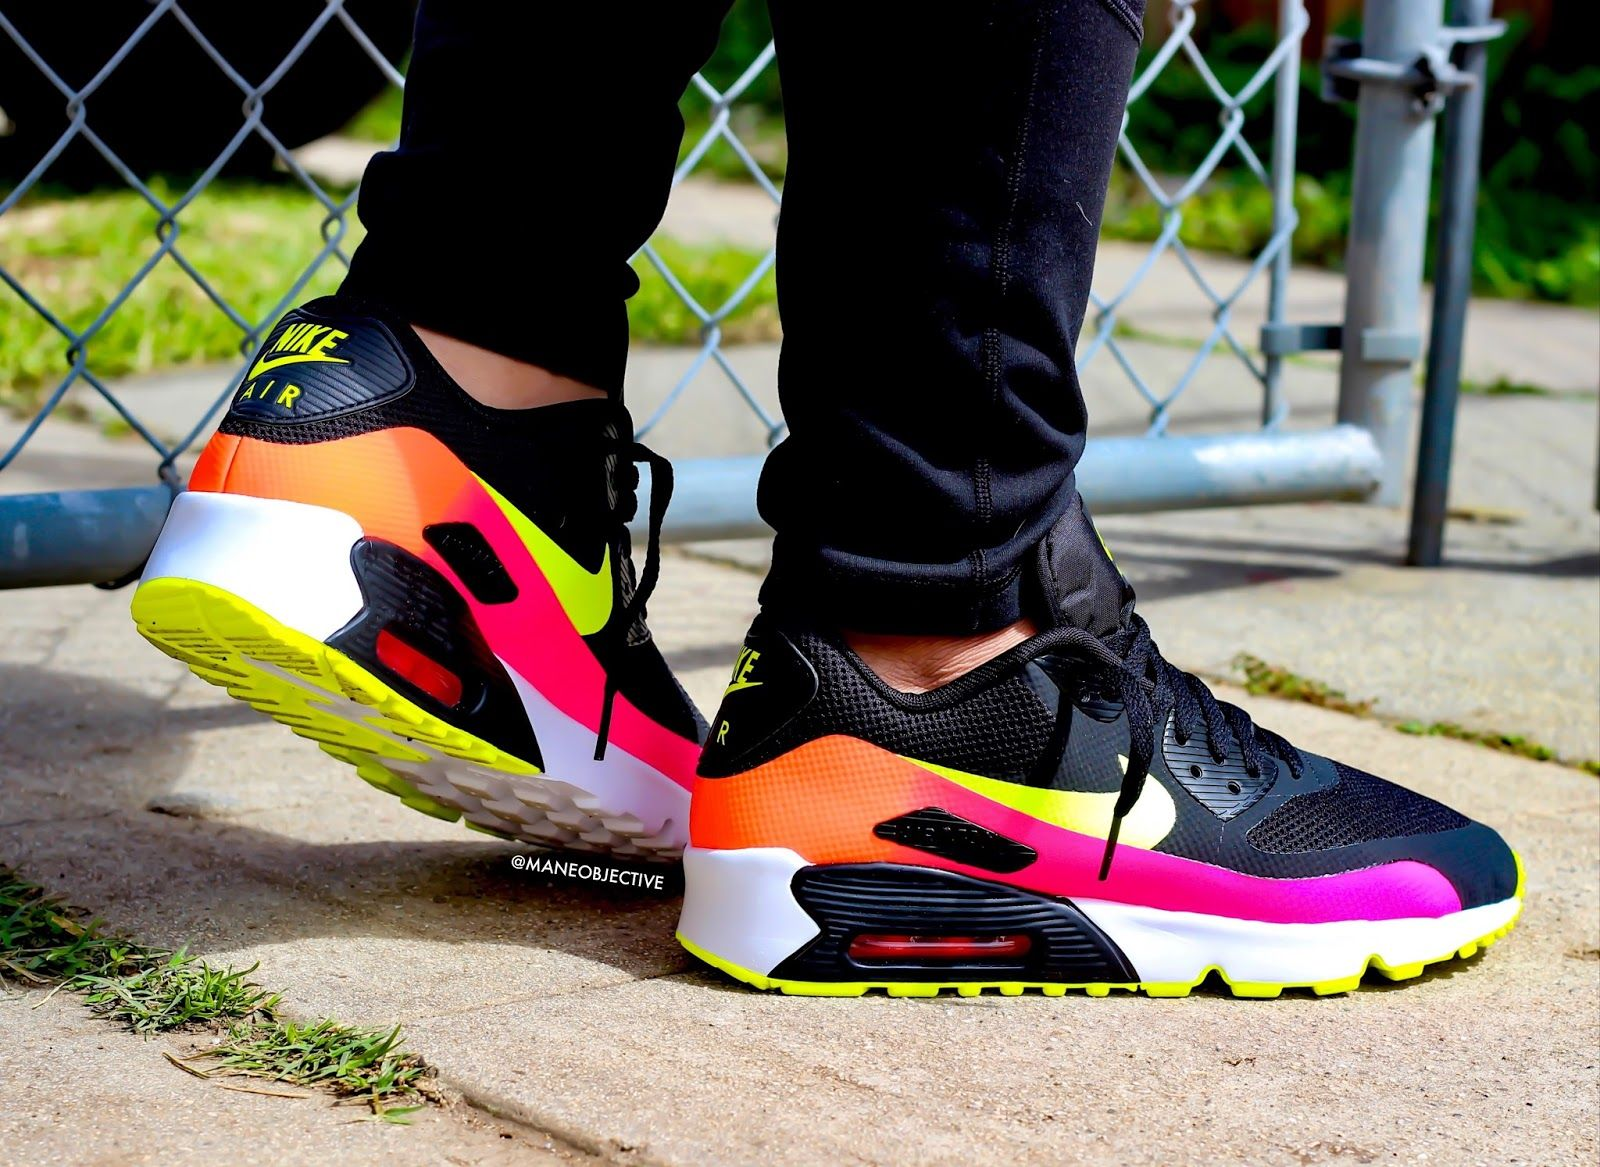 b999bbb44ade Nike Air Max 90 FB+ Black Volt Total Crimson Pink Blast